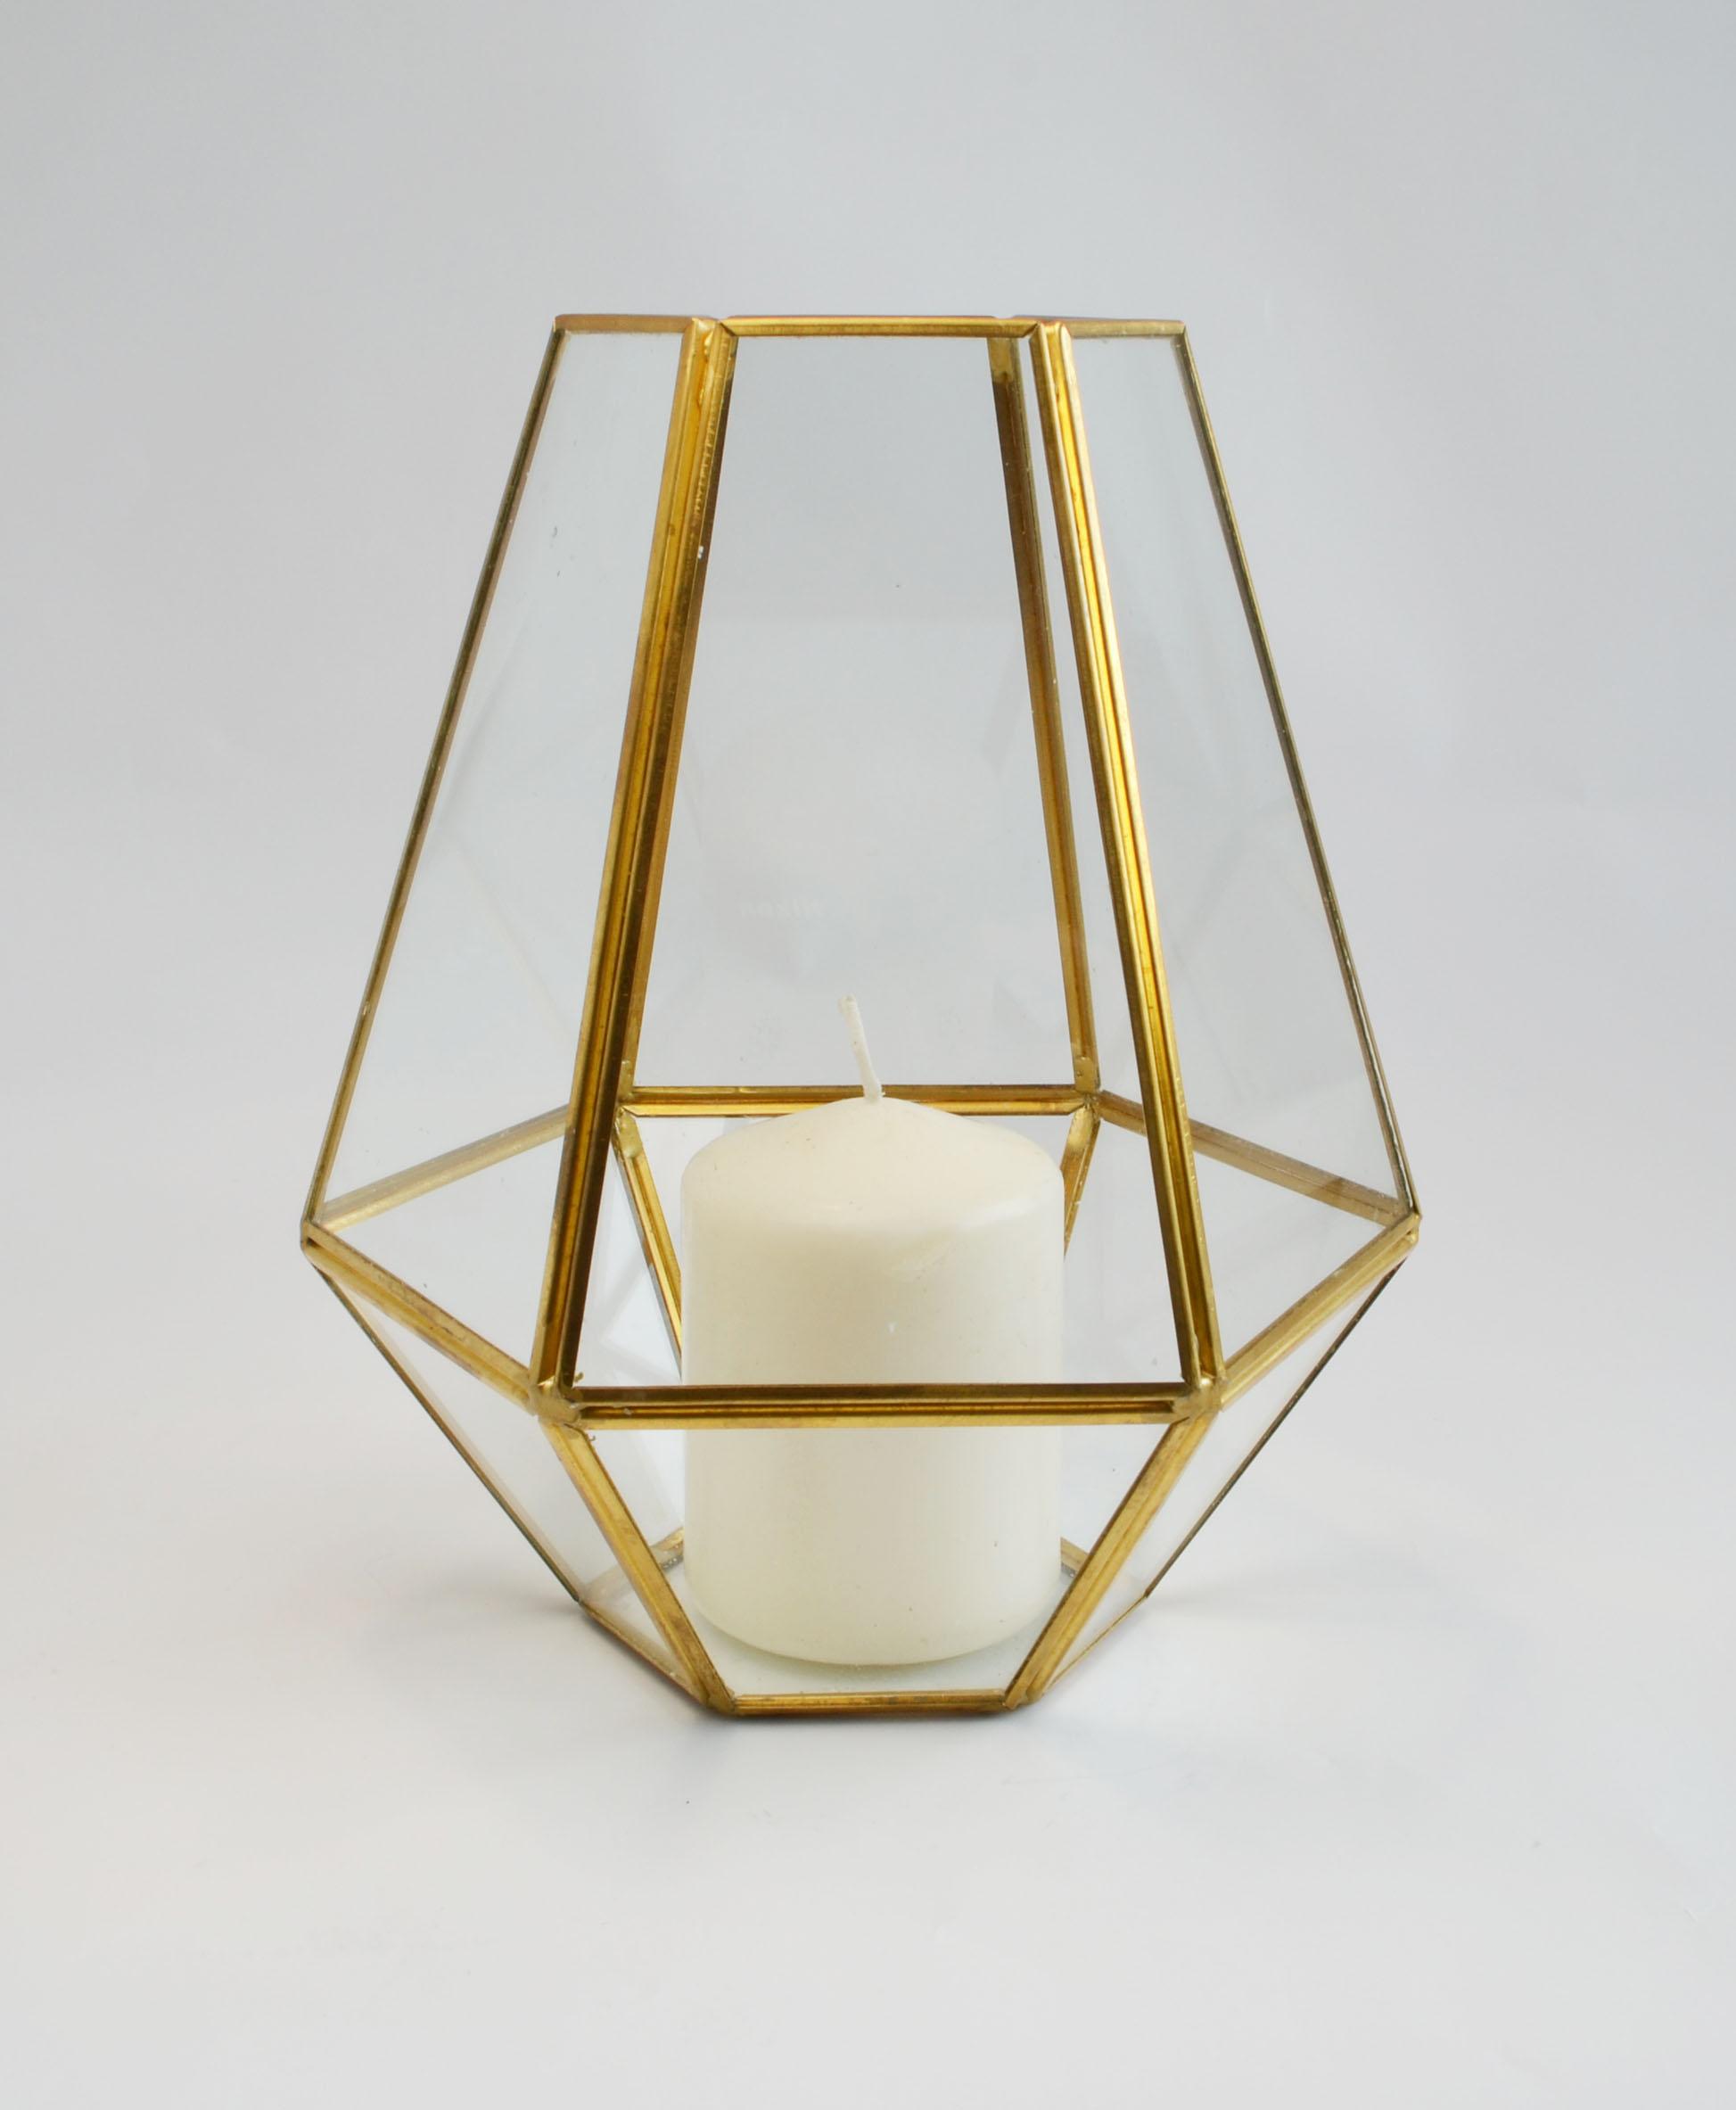 kailey lantern - small   Quantity: 3  Price: $15.00